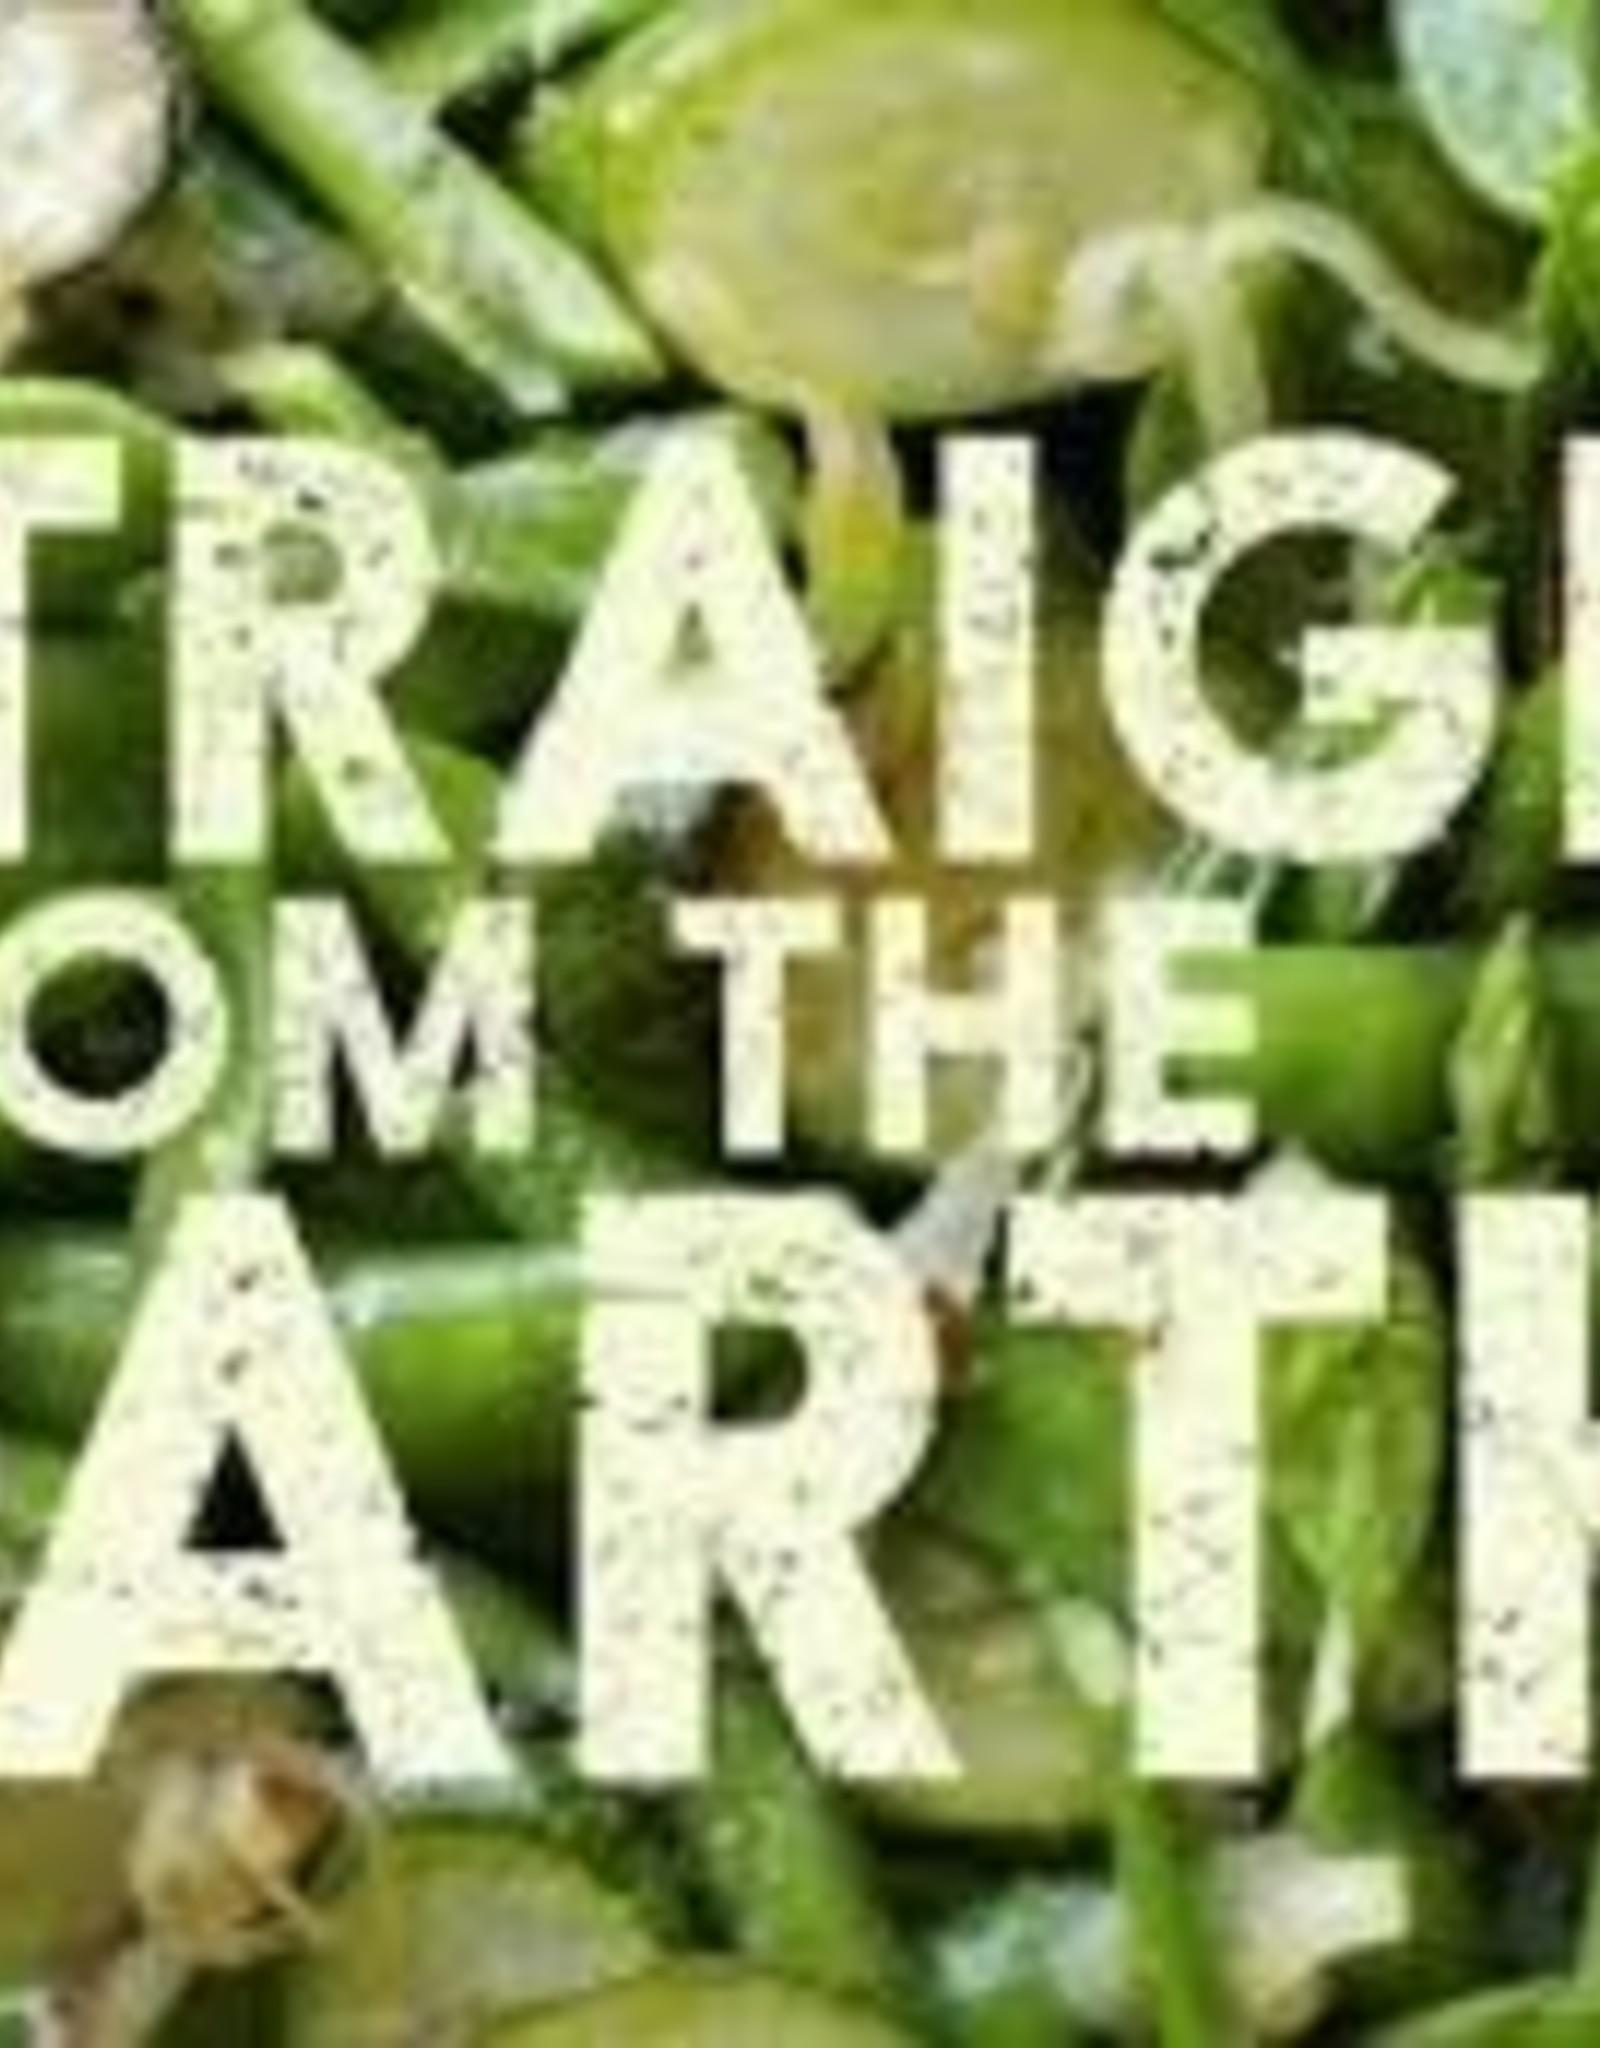 Chronicle Books Straight from the Earth by Myra Goodman & Marea Goodman